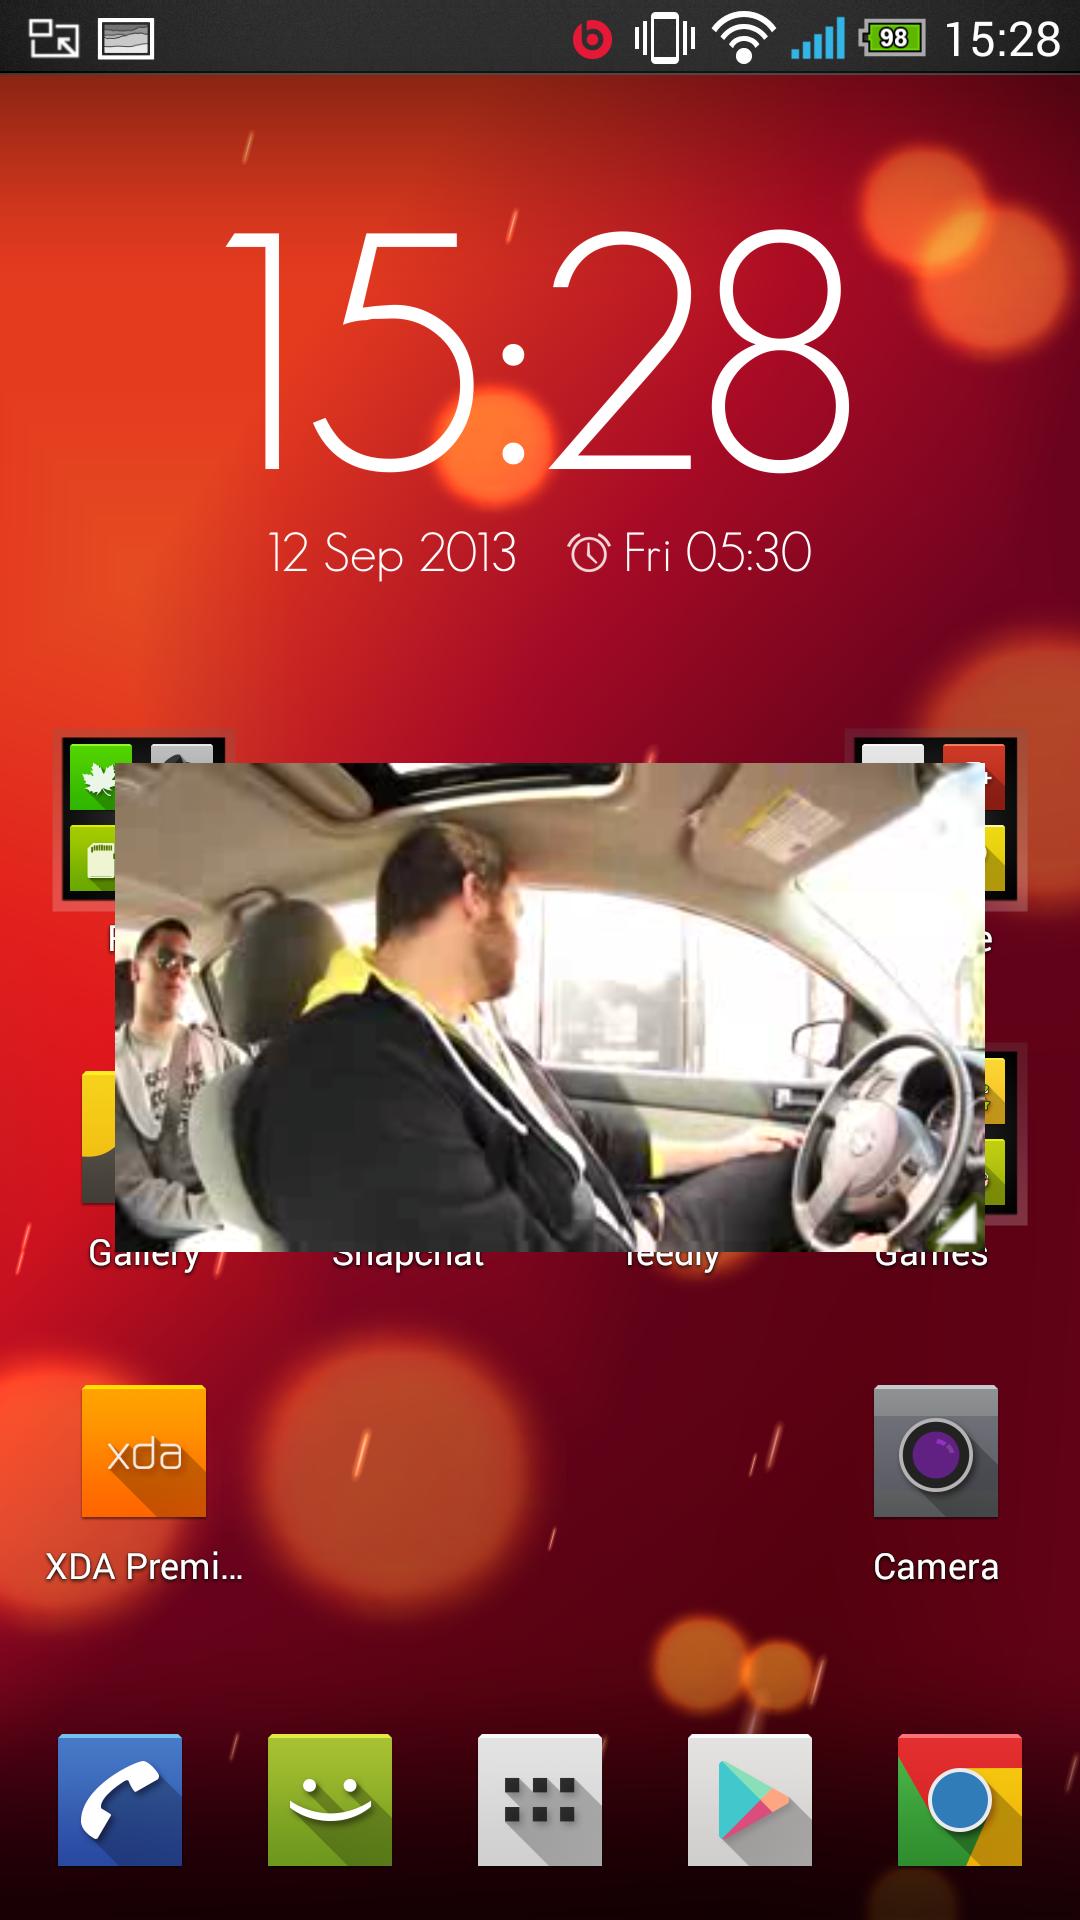 Screenshot_2013-09-12-15-28-24